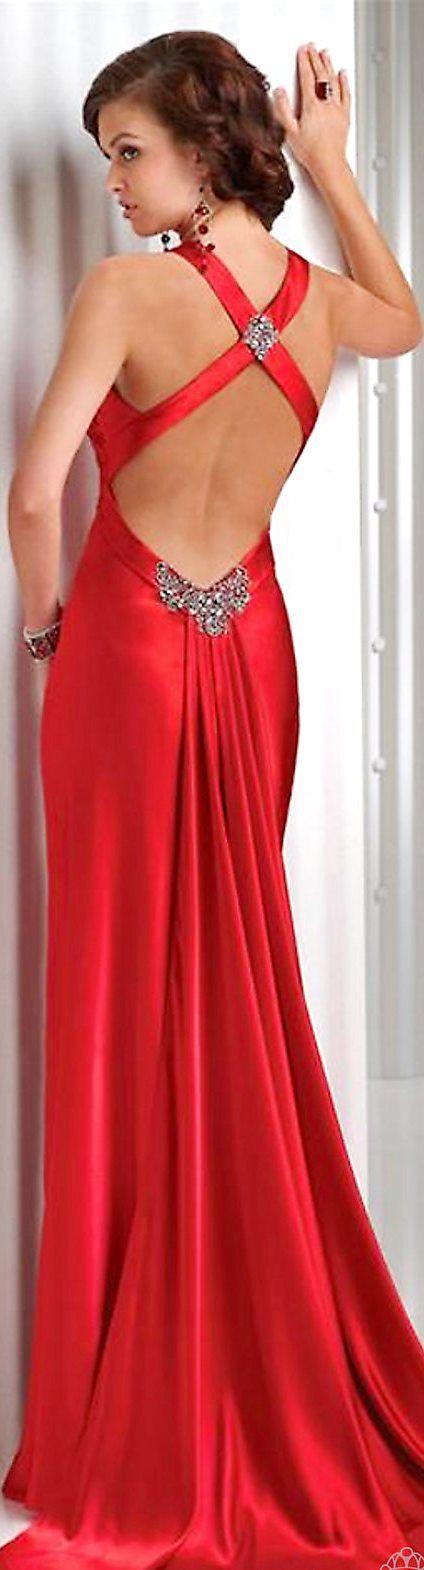 Nice open dress